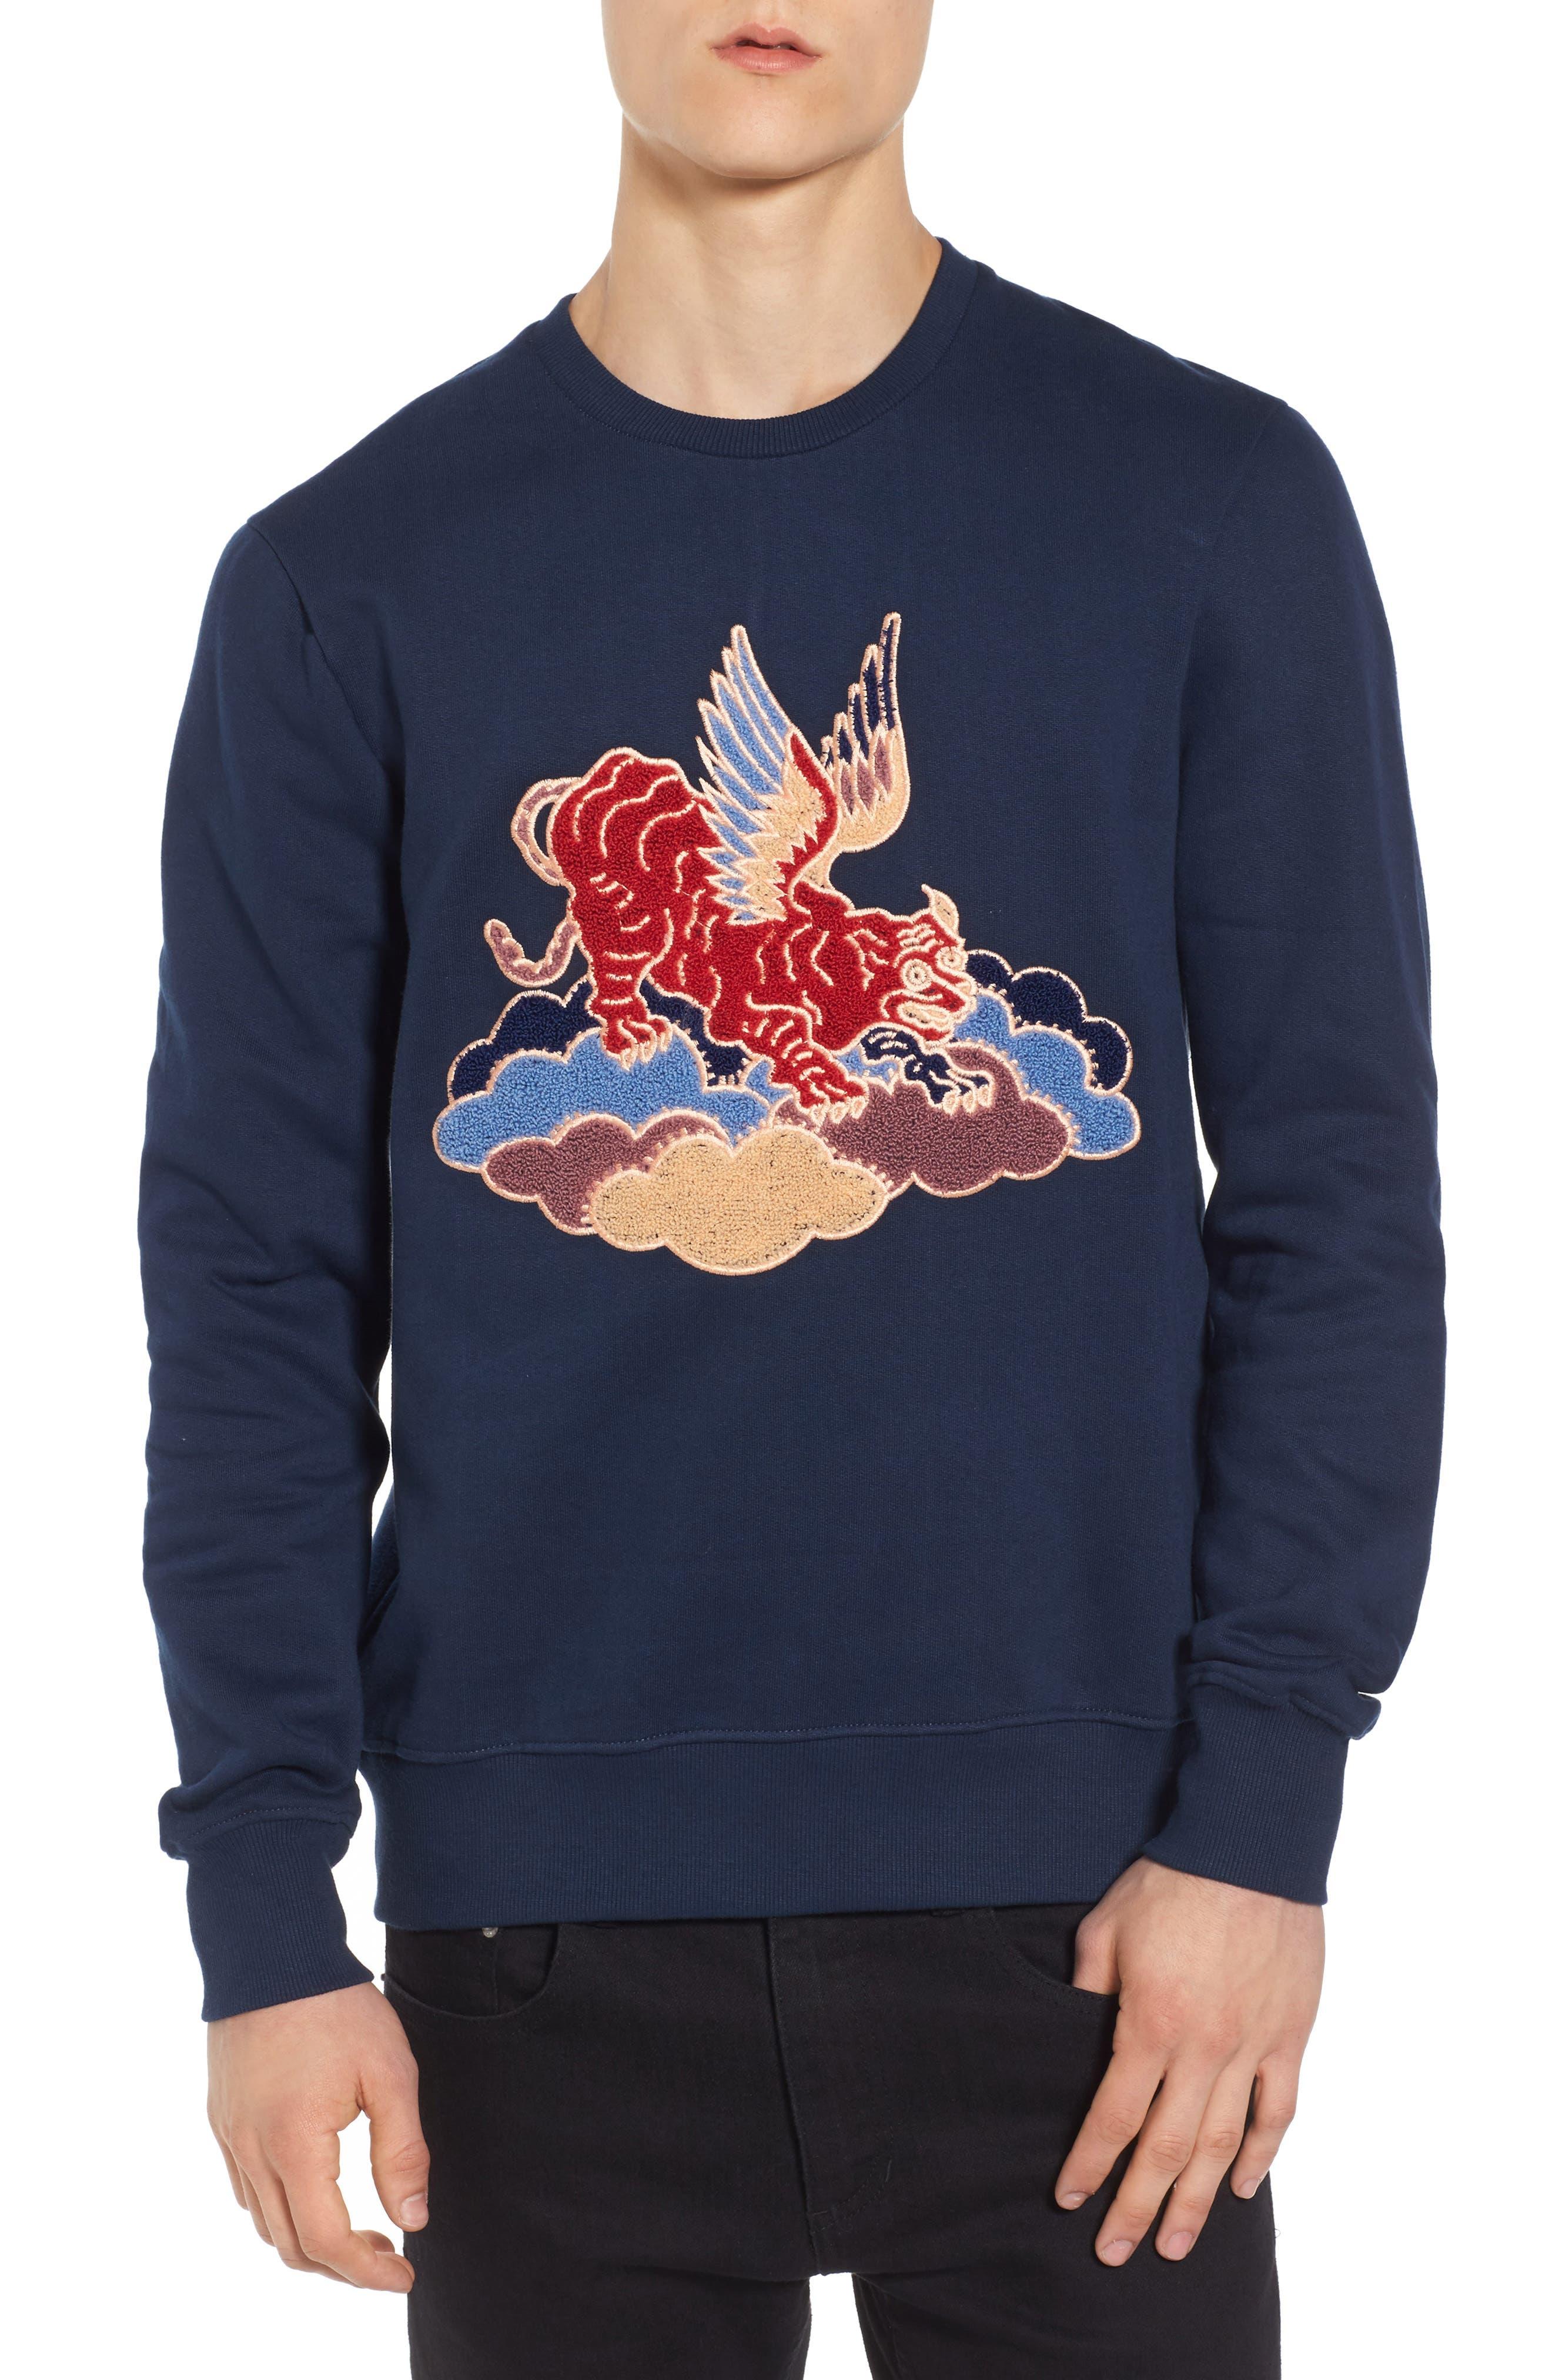 Nokat Appliqué Sweatshirt,                             Main thumbnail 1, color,                             018